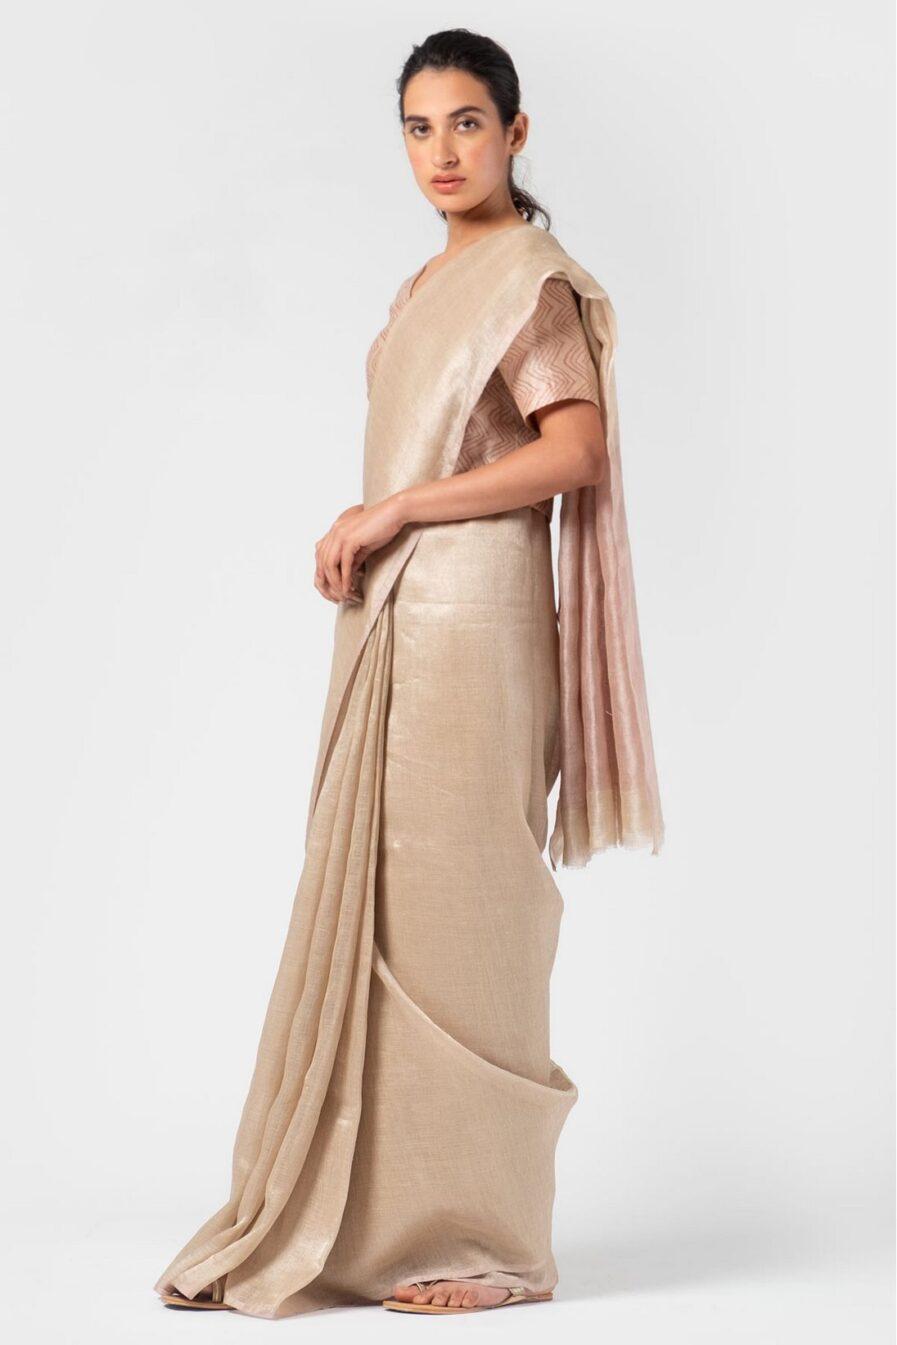 Anavila Thistle pink metallic sari